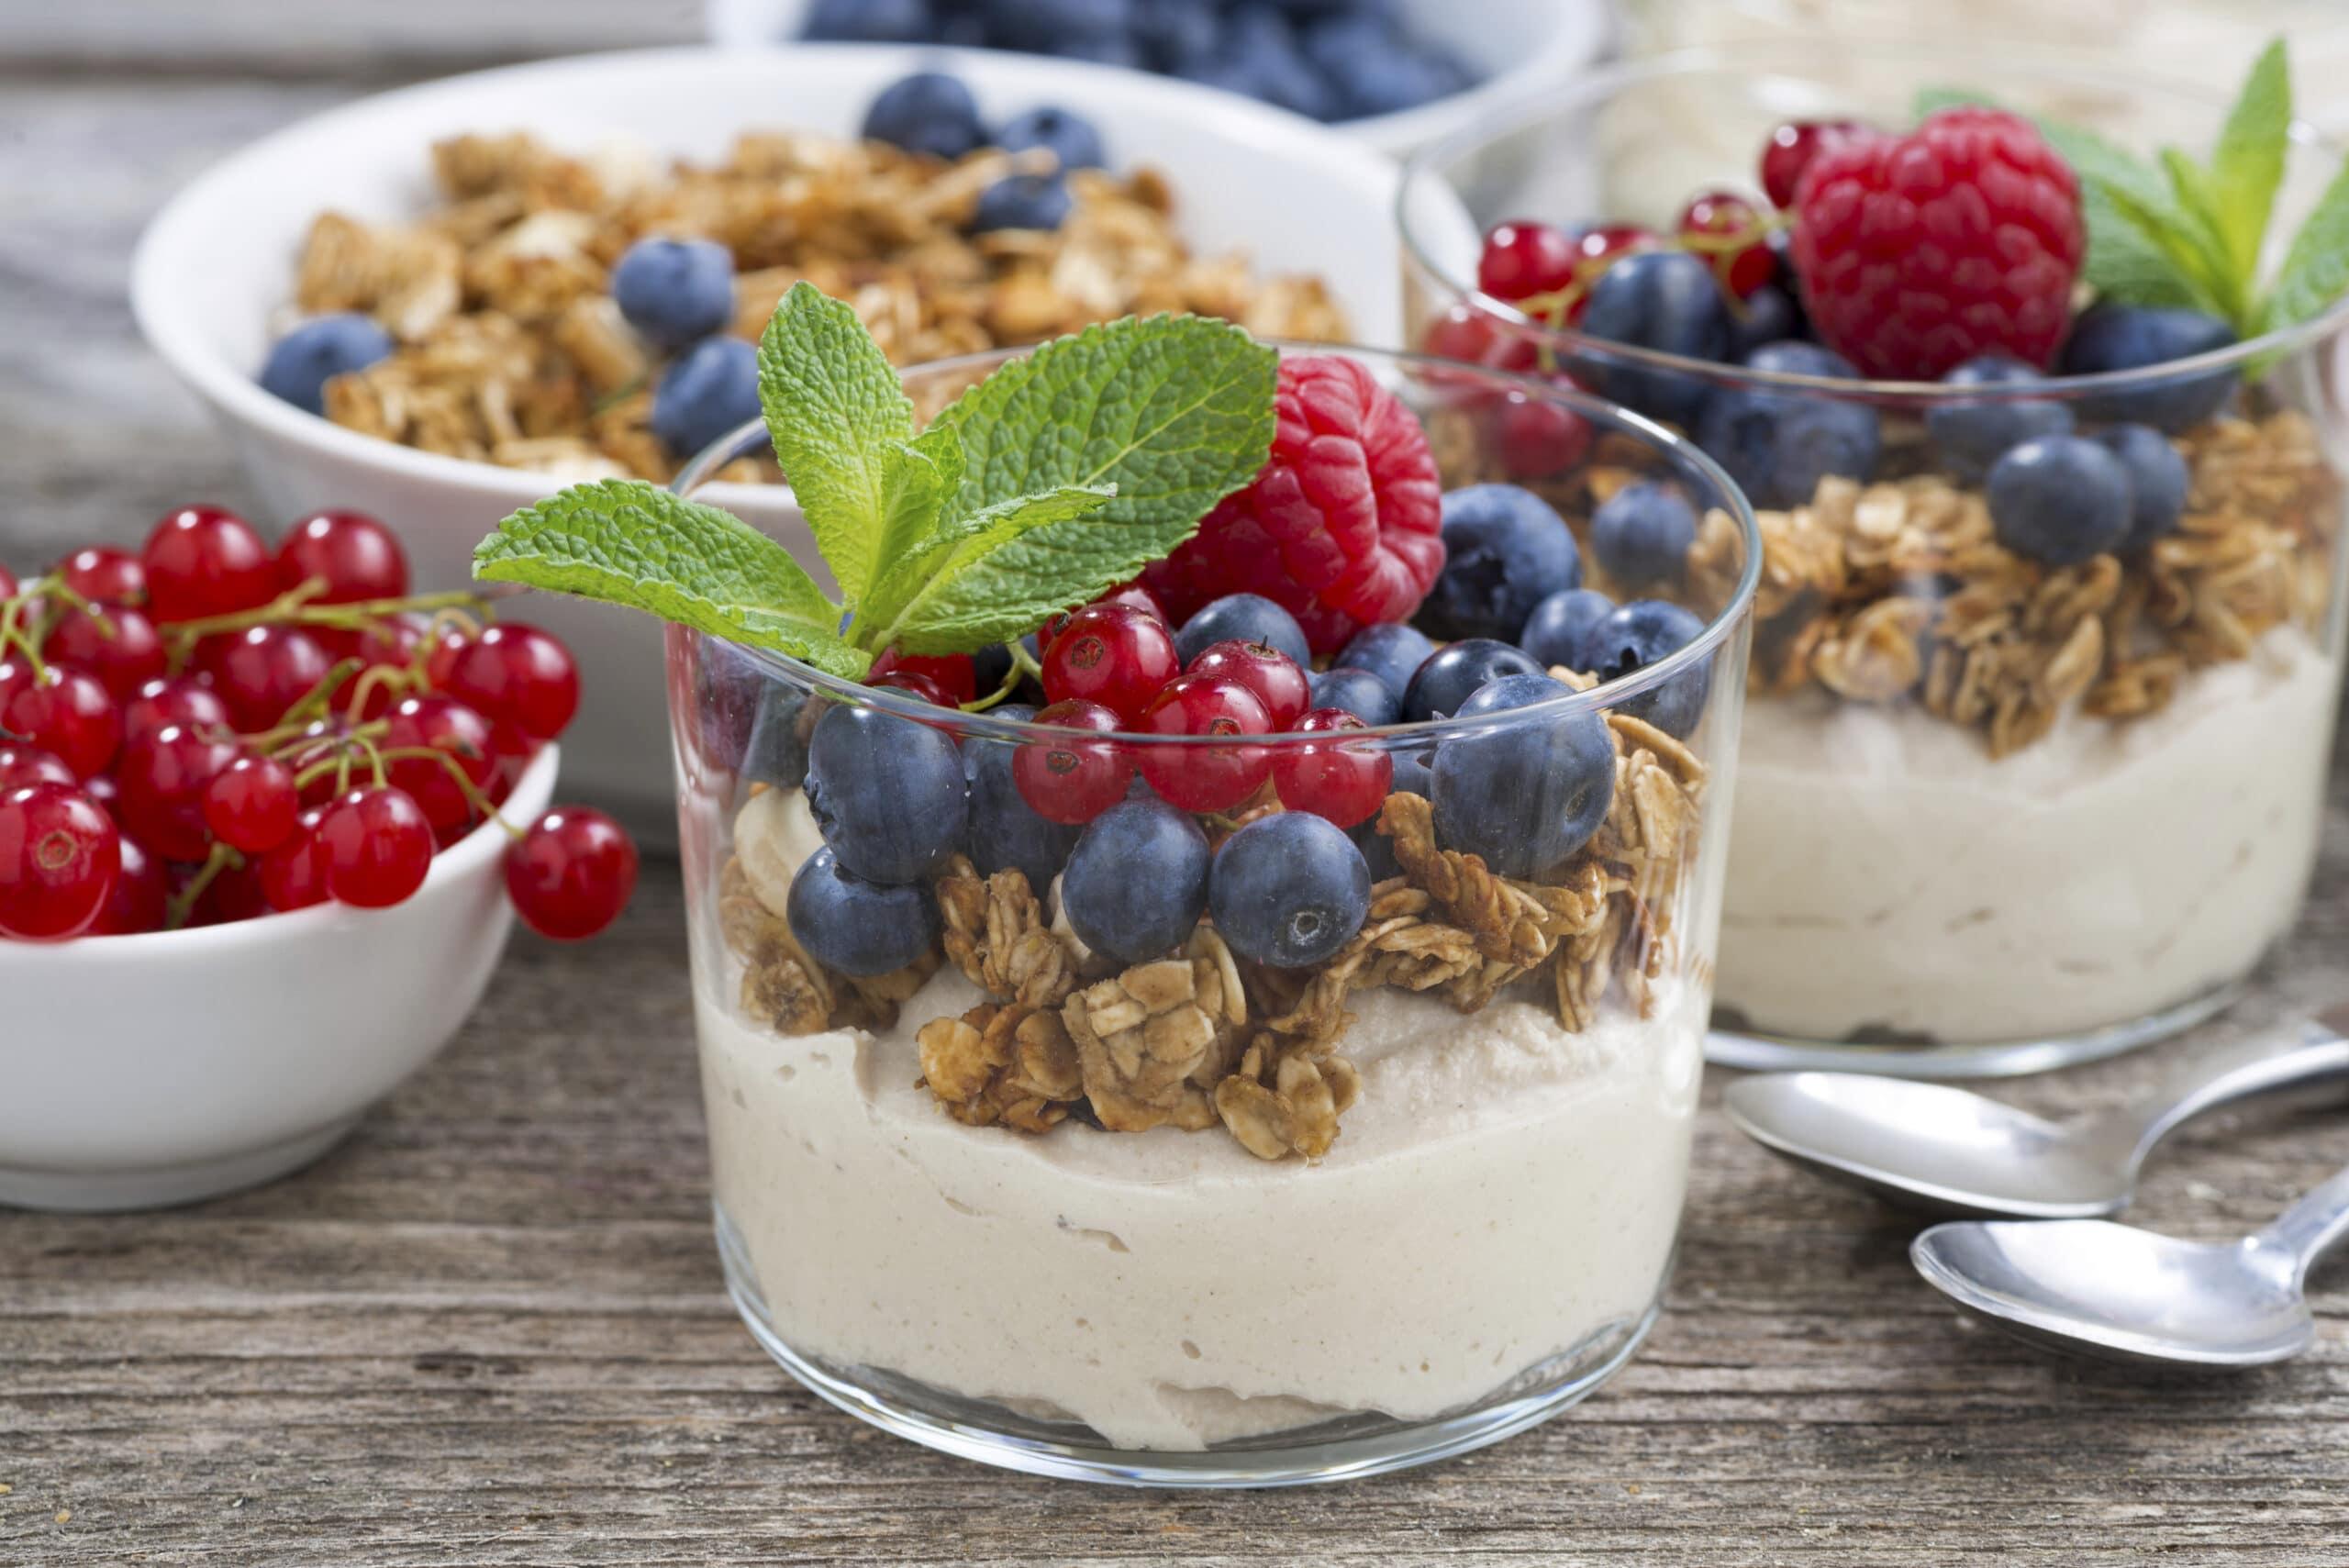 dessert with sweet cream, fresh berries and granola, closeup, horizontal